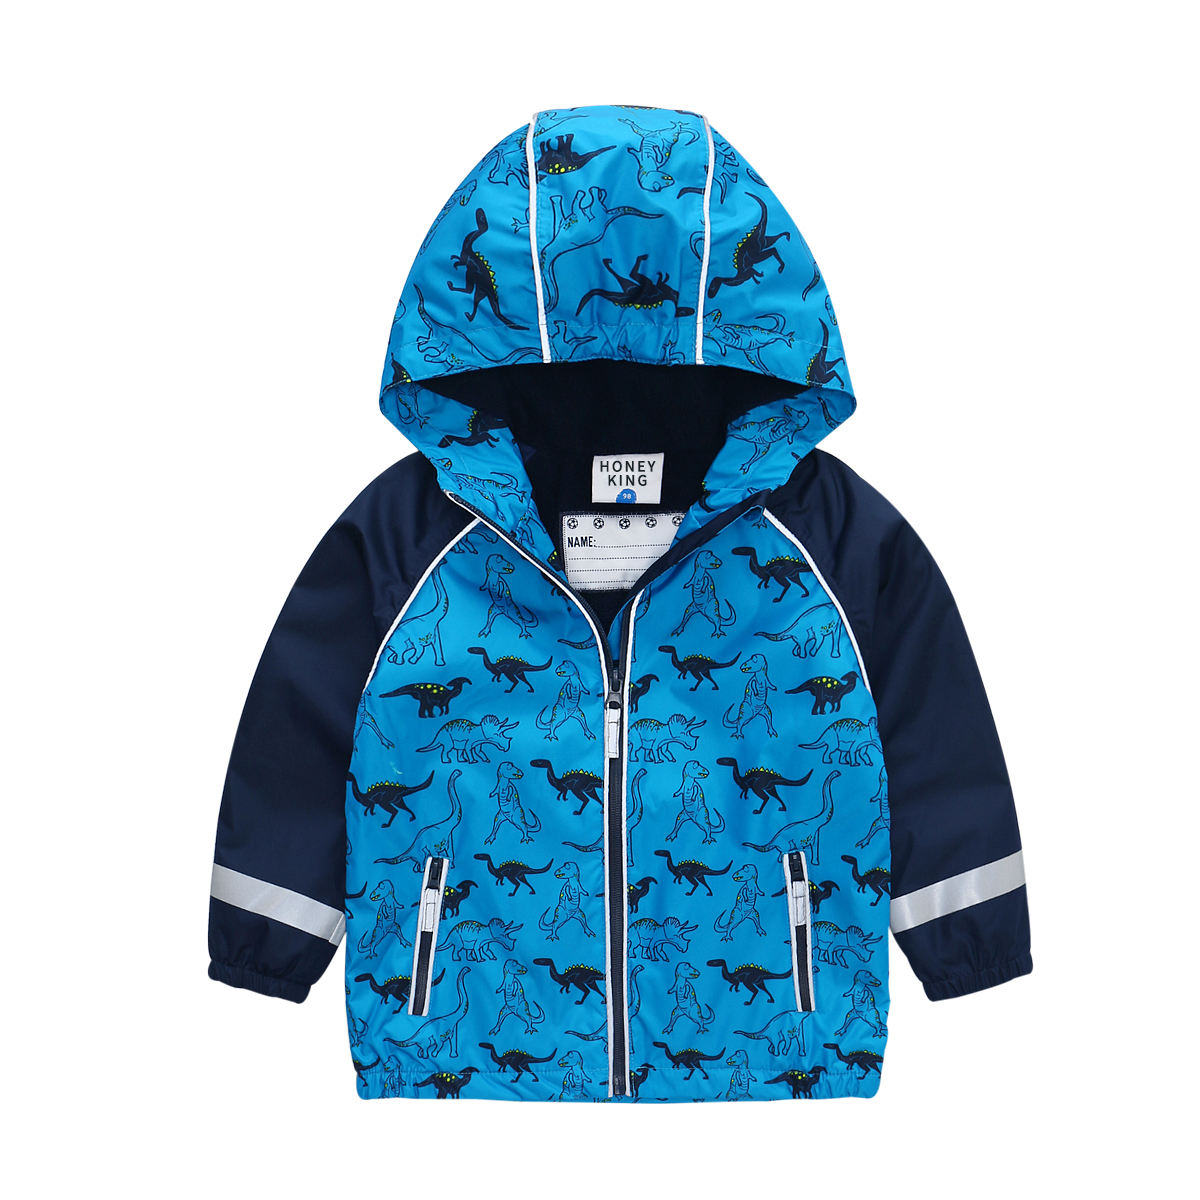 OEM Customization Kids Boys and girls woven rain jacket boys clothing custom rain jacket